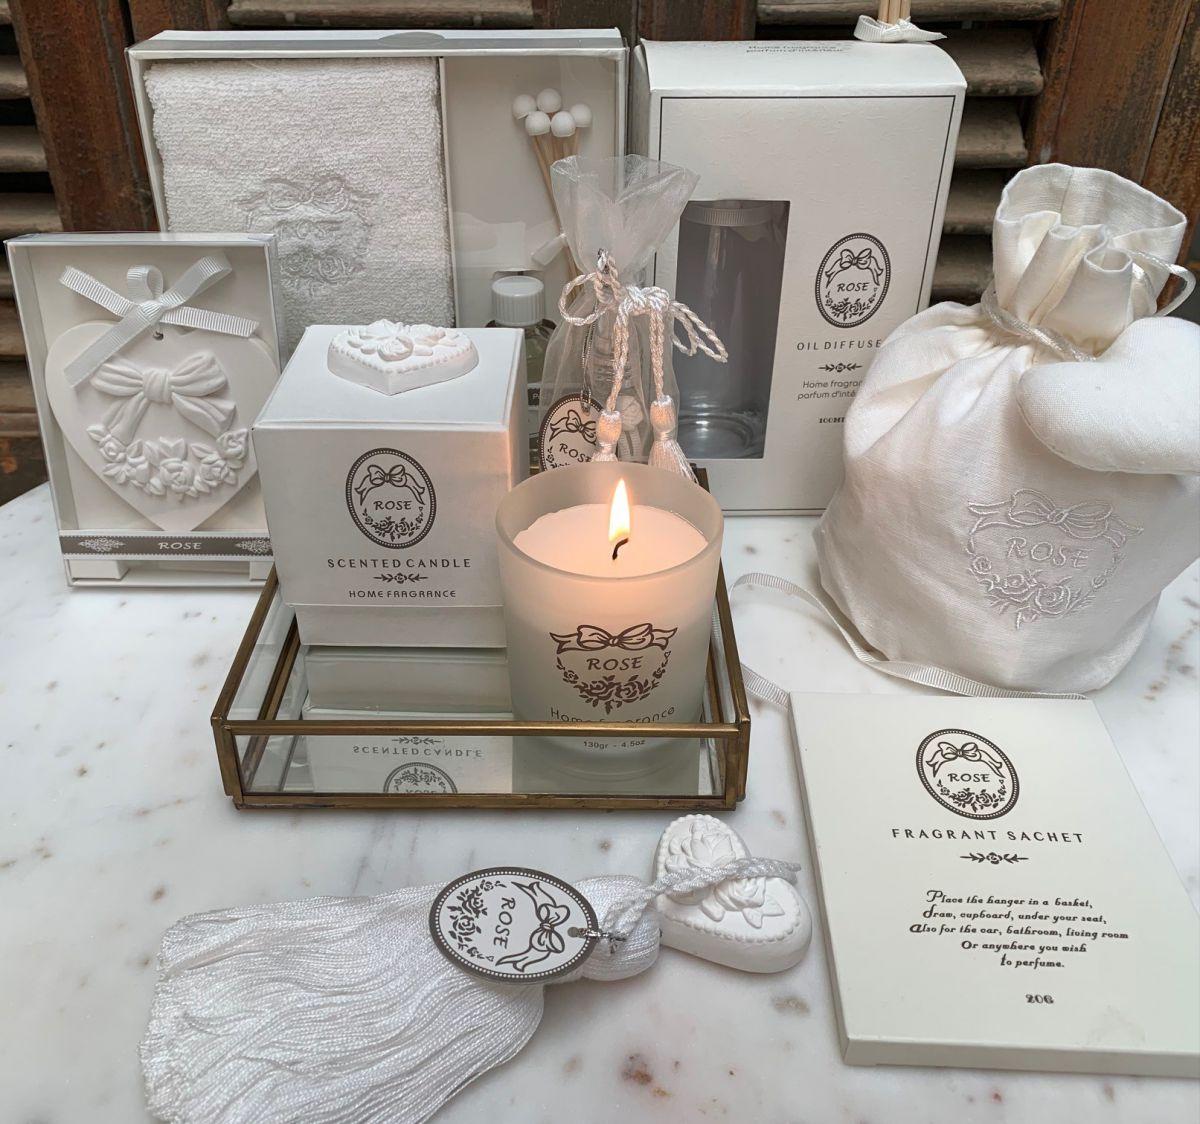 rose giftset de luxe wtowel stones oil diffuser